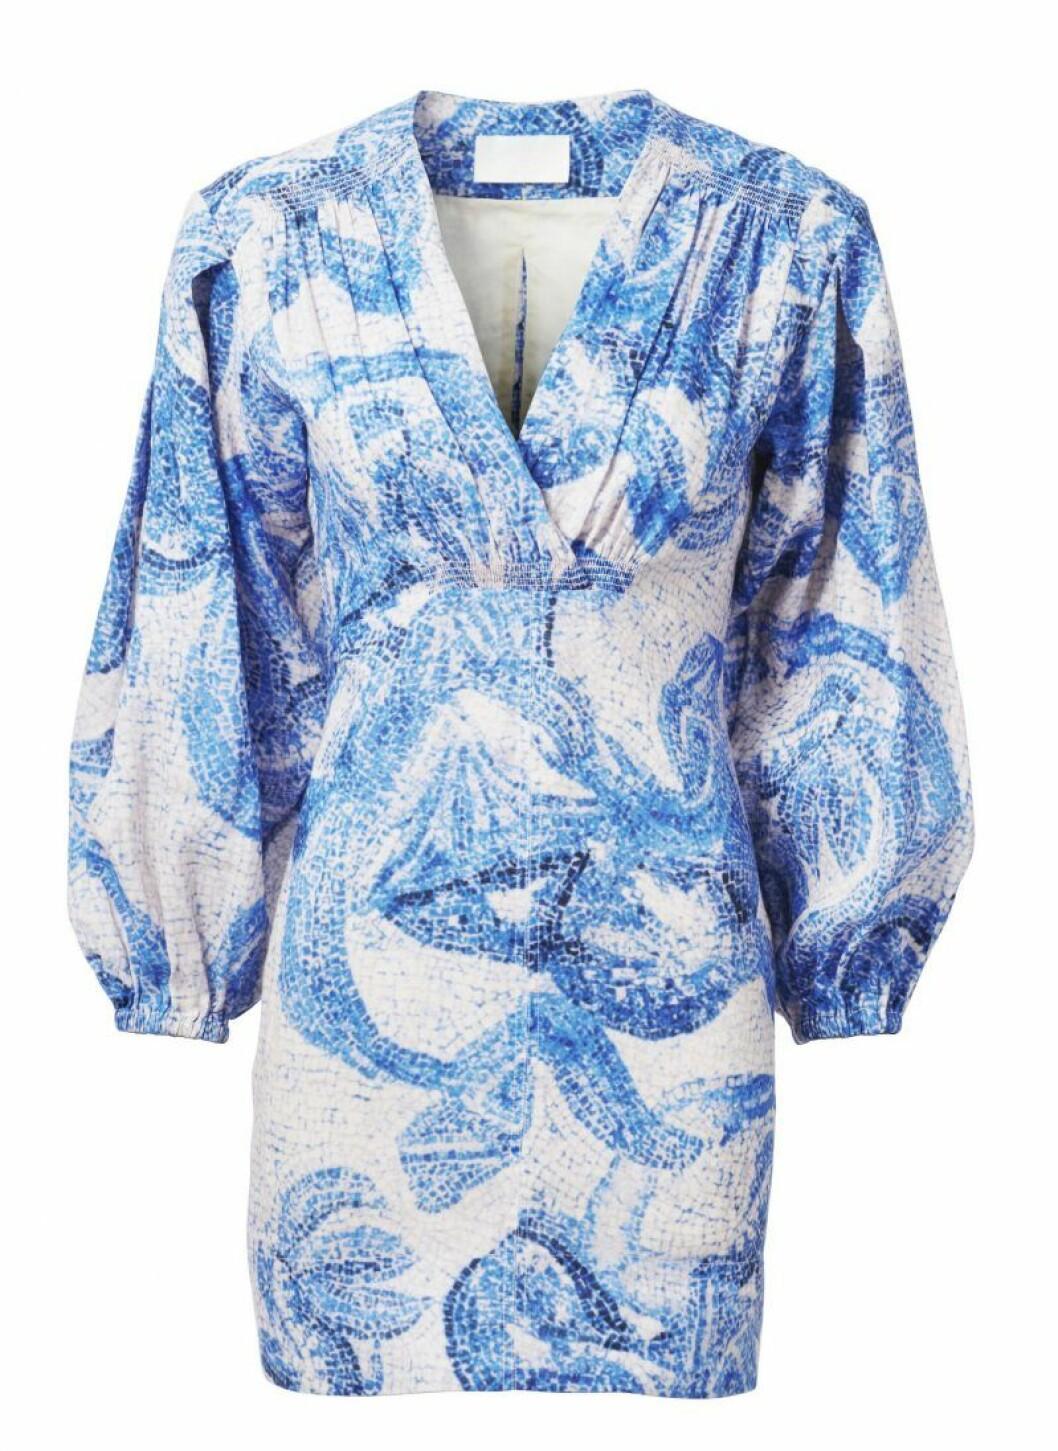 H&M Conscious Exclusive SS20 blåvit mönstrad klänning